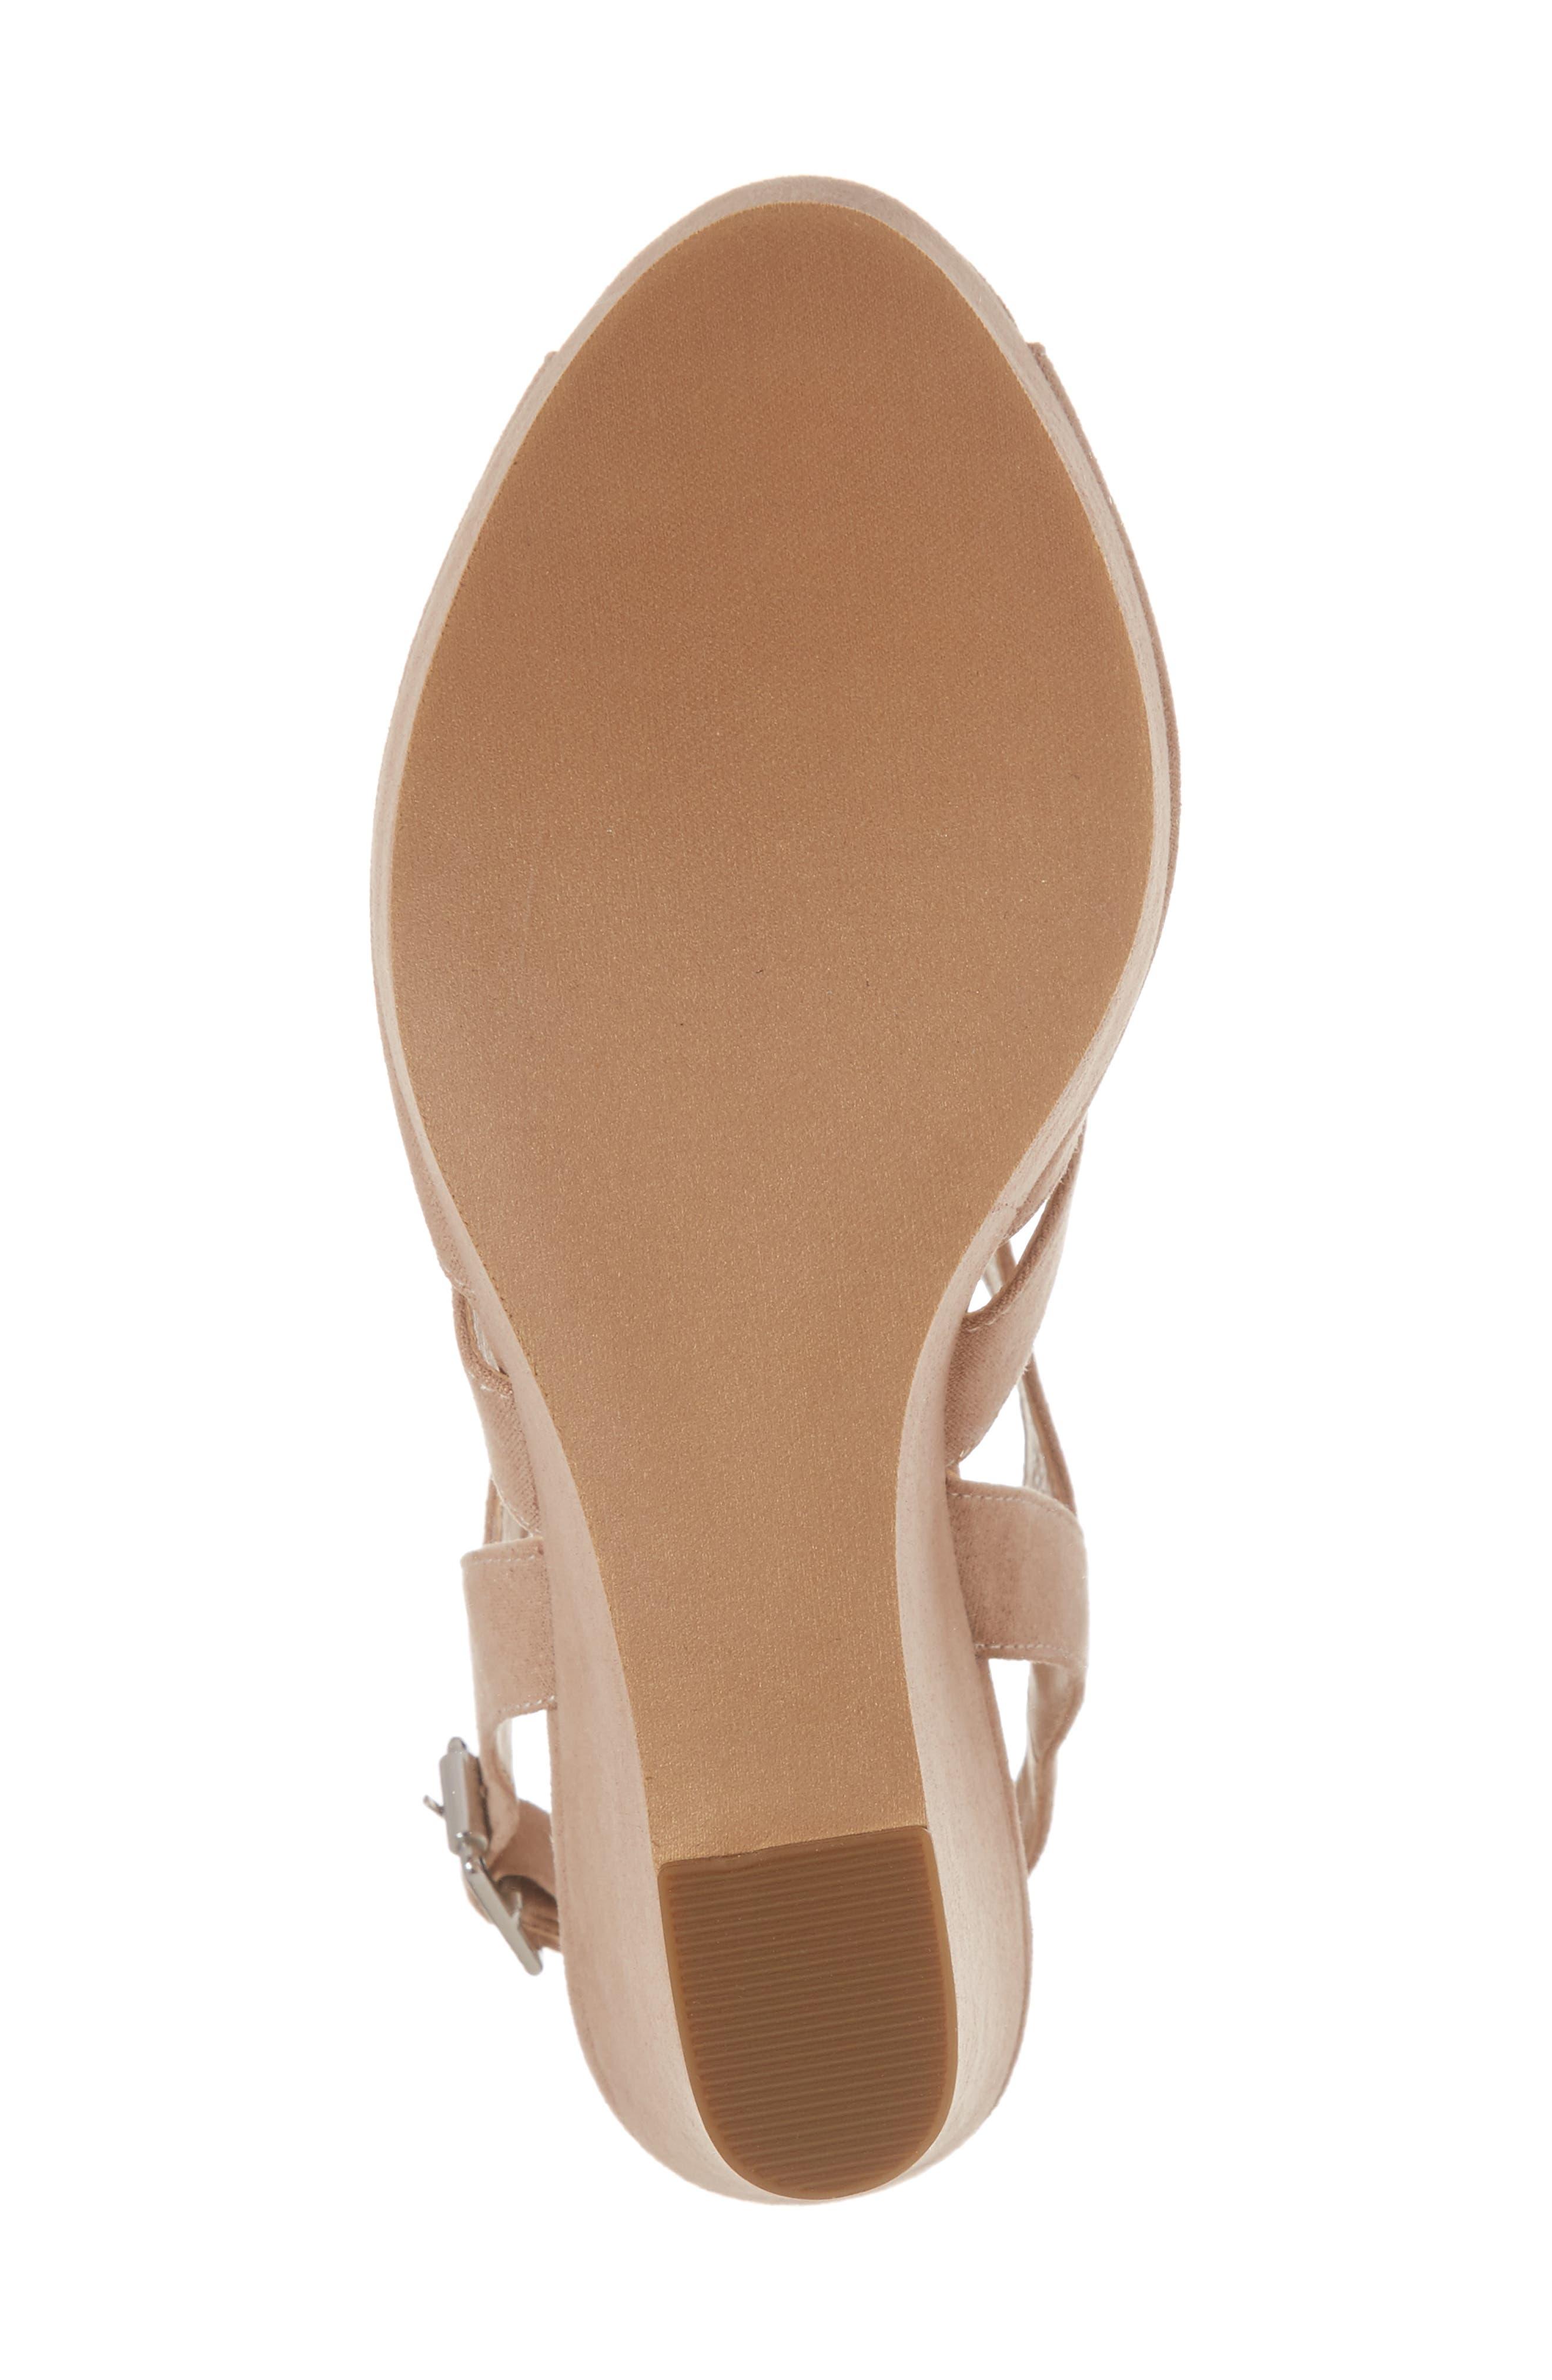 Sunny Platform Wedge Sandal,                             Alternate thumbnail 35, color,